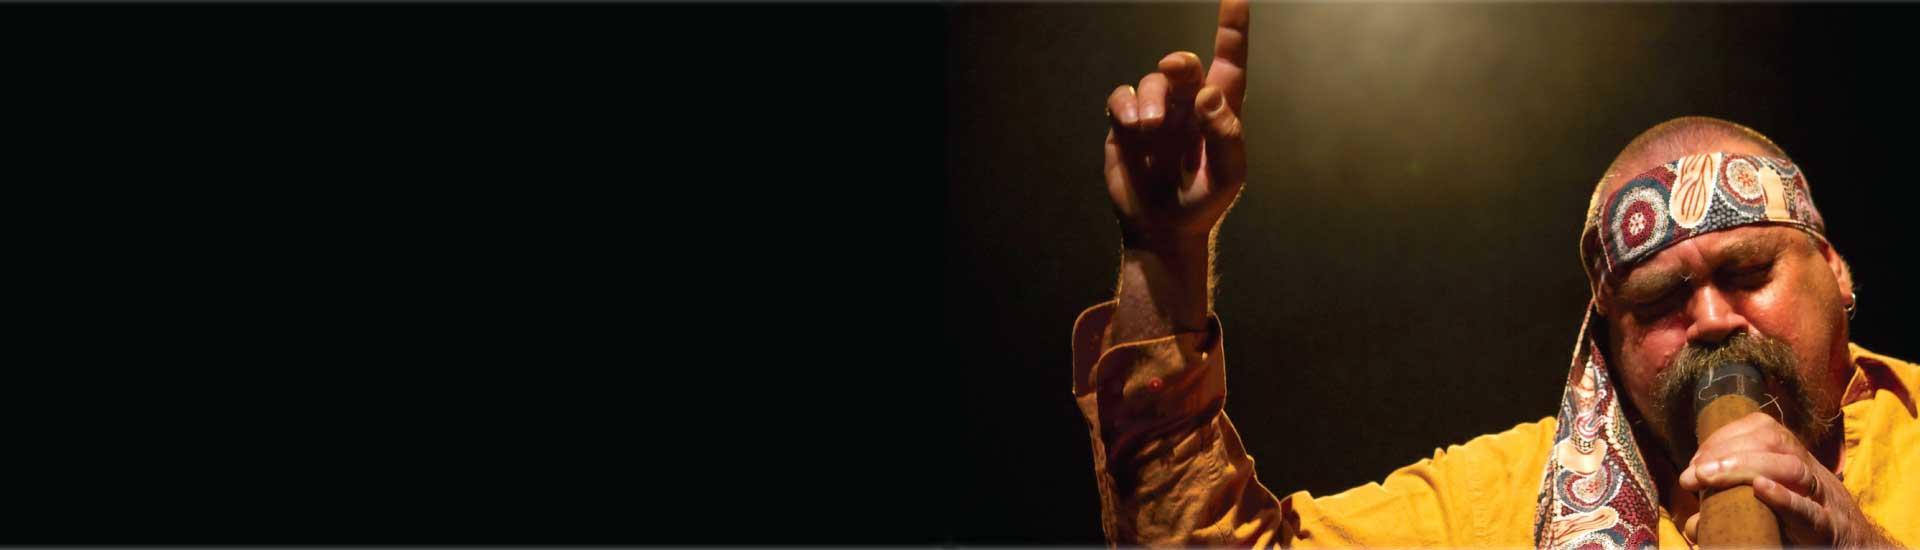 Mark Atkins, Didgeridoo Artist, Aboriginal storyteller, aboriginal artist, aboriginal culture, cully fest, outback and aboriginal folk festival, easter school holidays 2016, cunnamulla